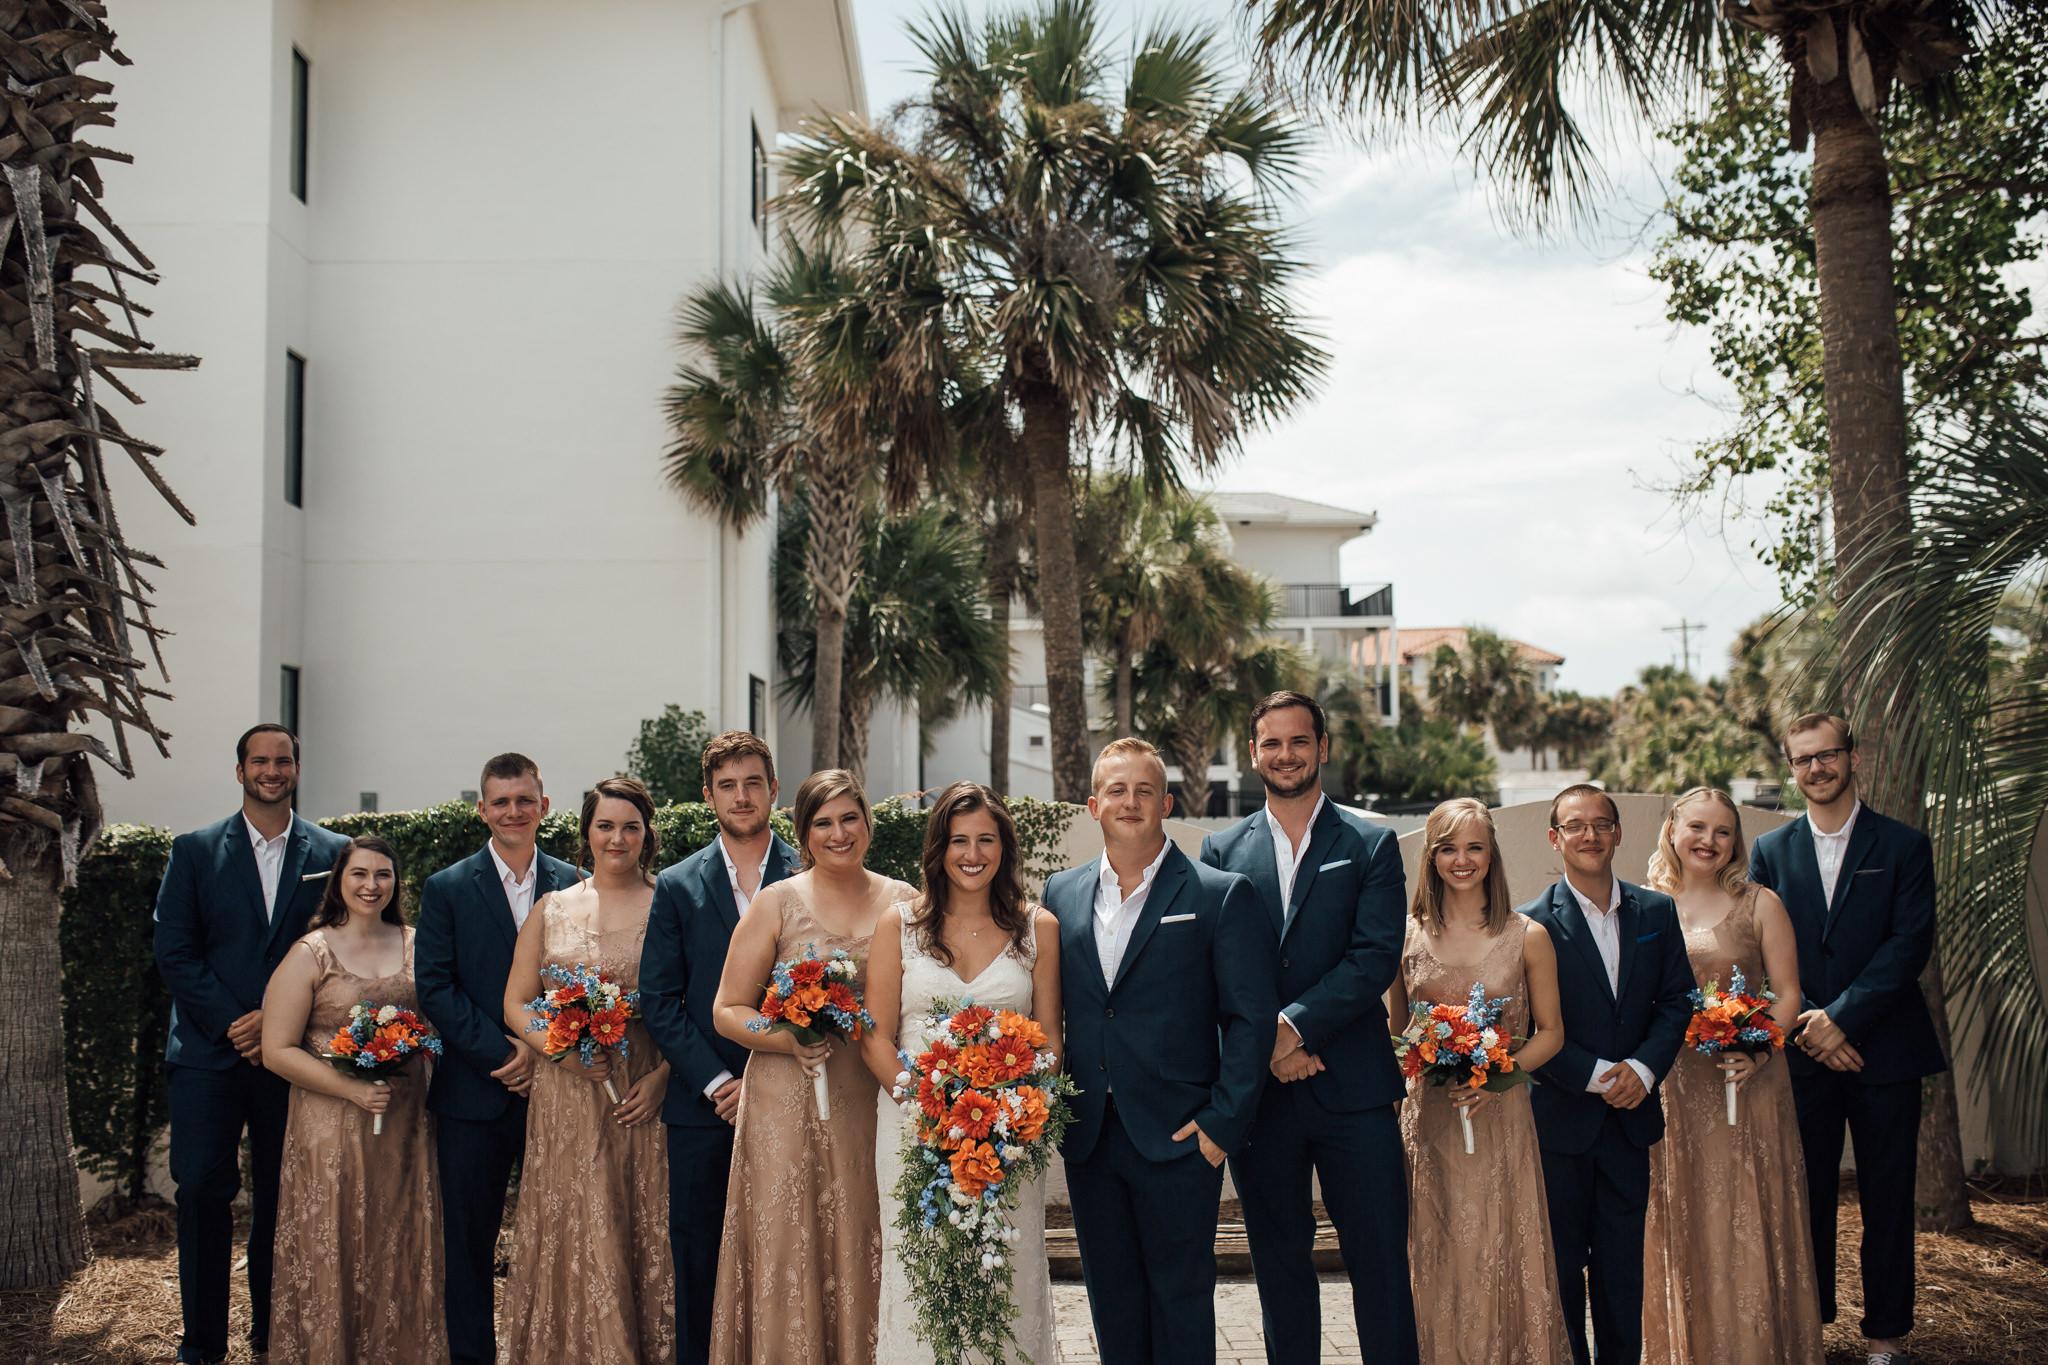 cassie-cook-photography-santa-rosa-beach-wedding-farrar-wedding-27.jpg